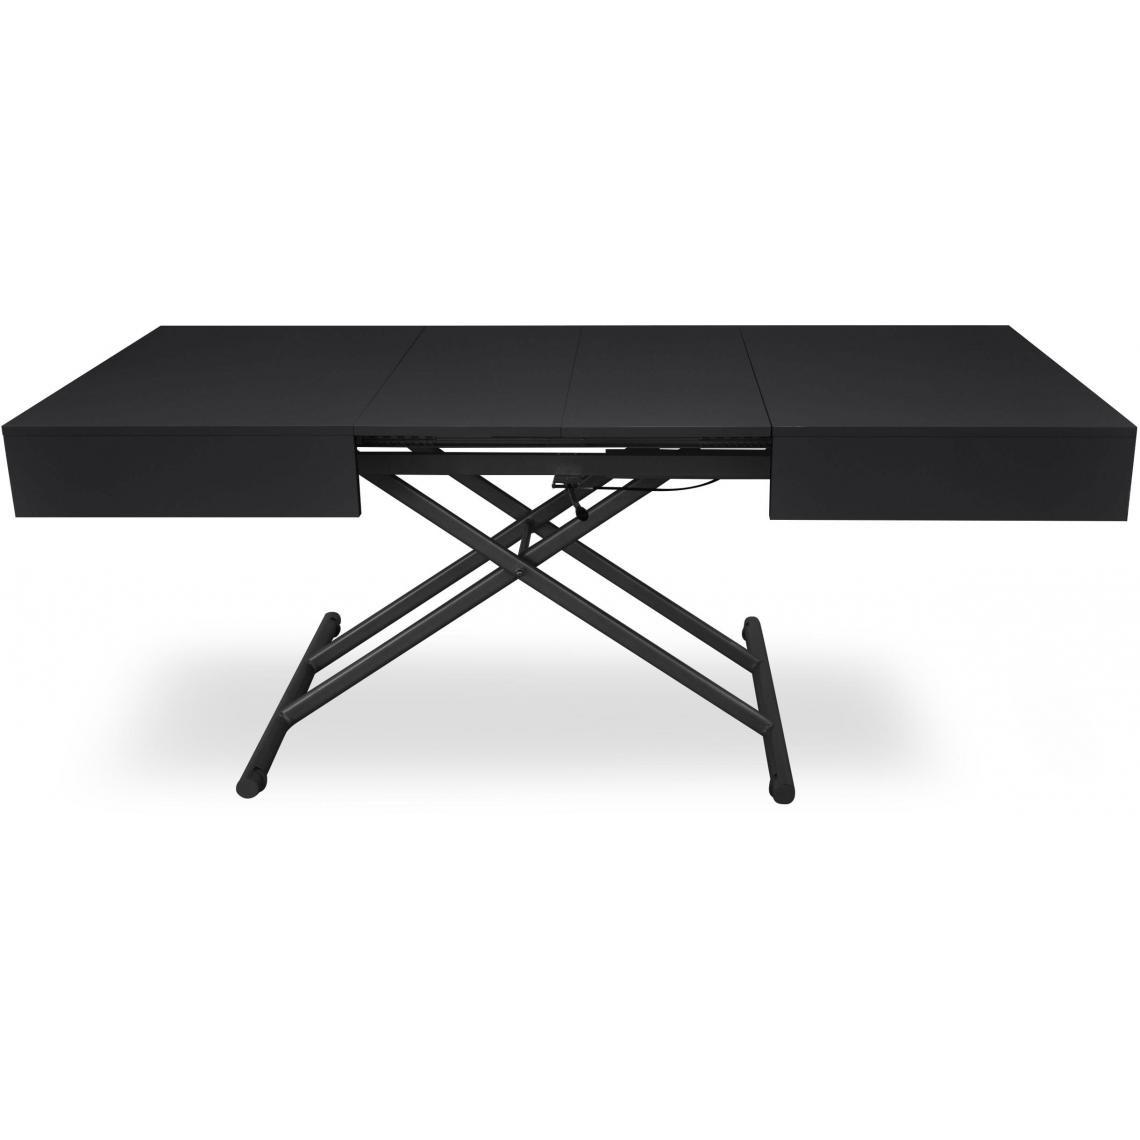 table basse relevable noir mat cassy